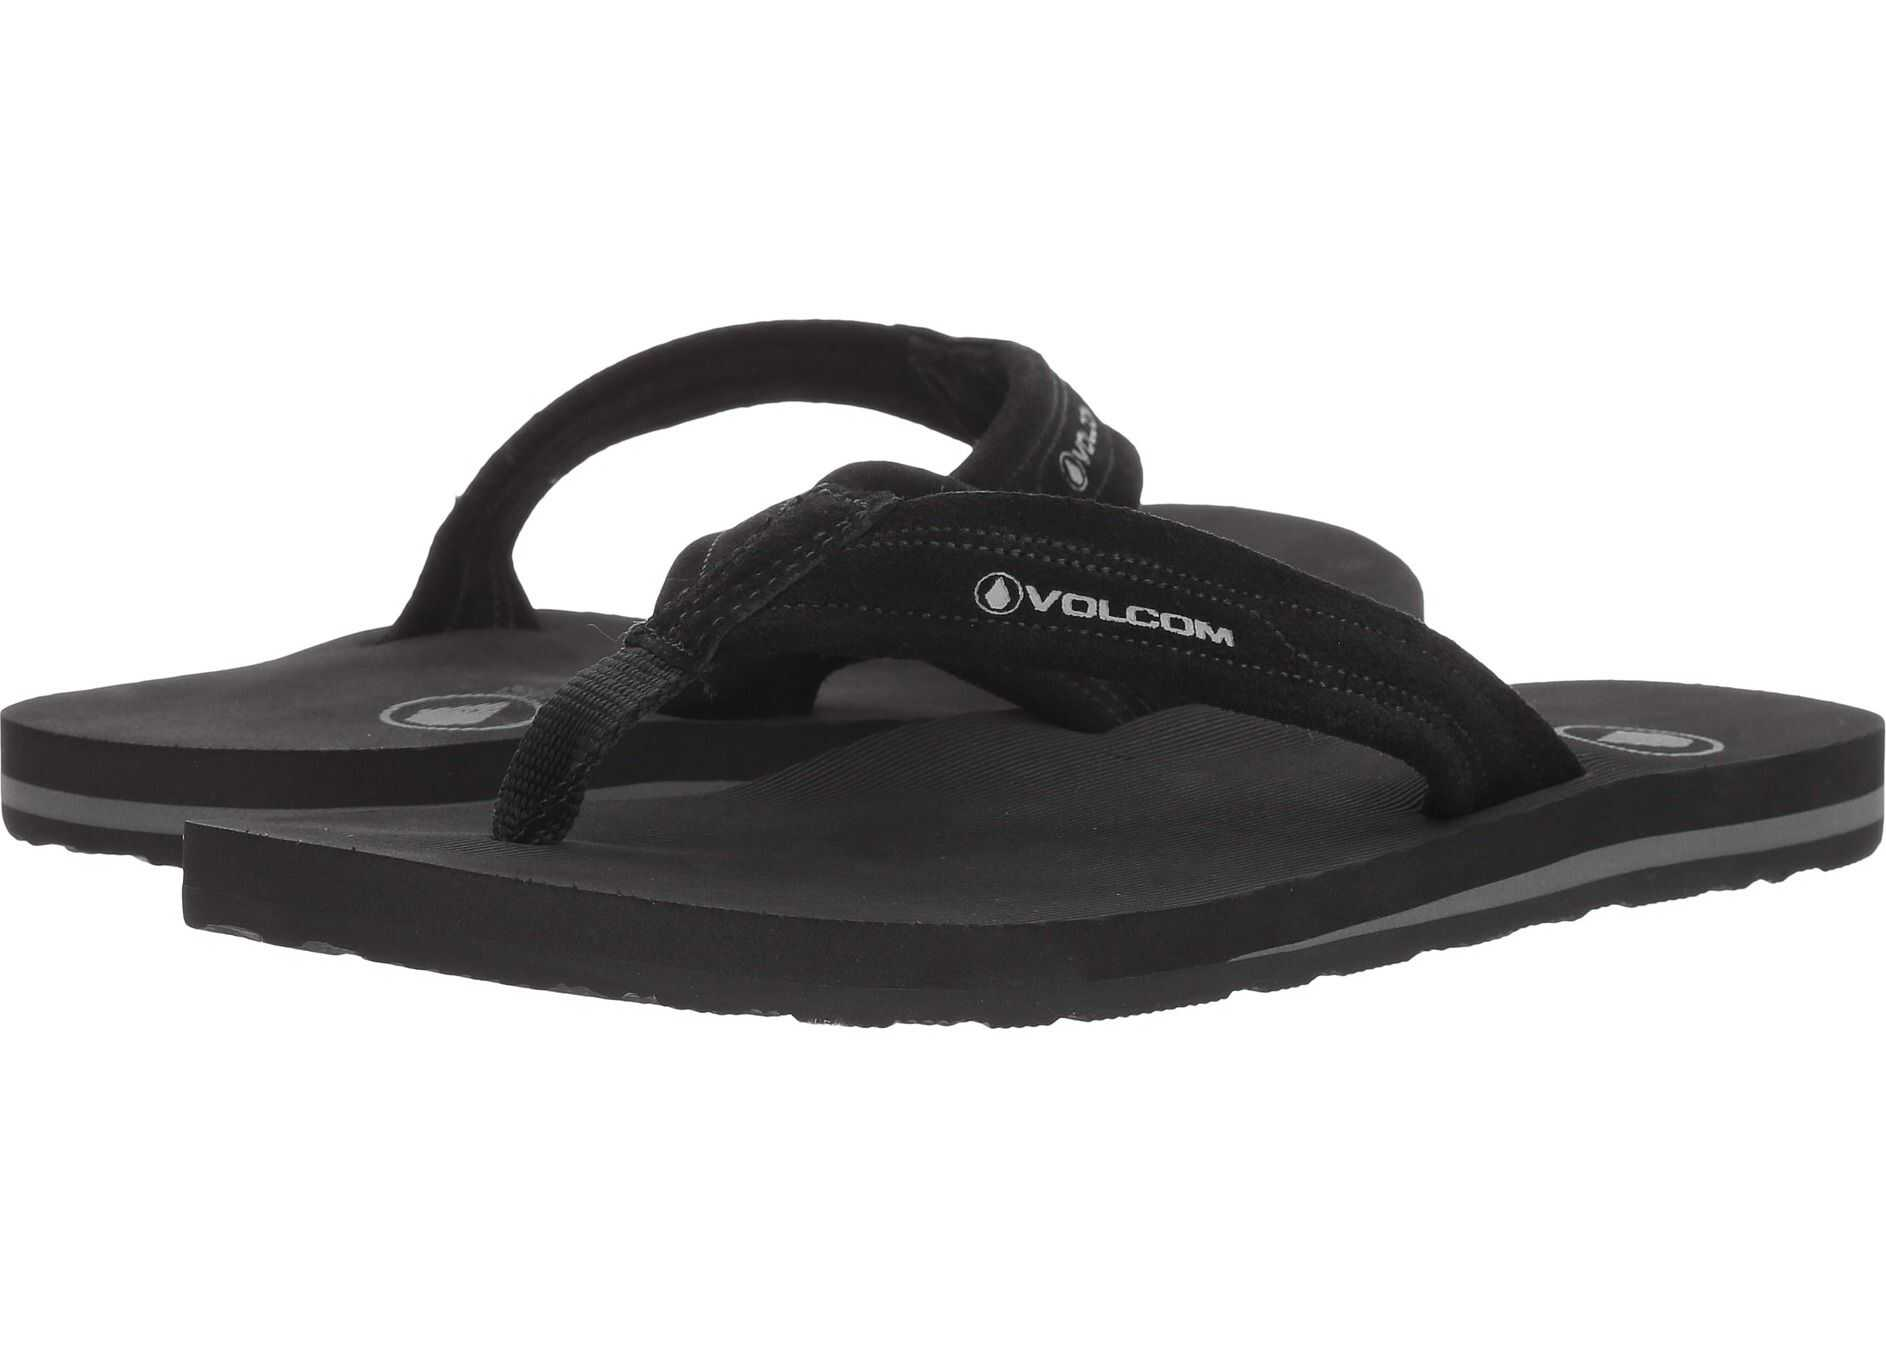 Volcom Driftin Leather Sandal Black